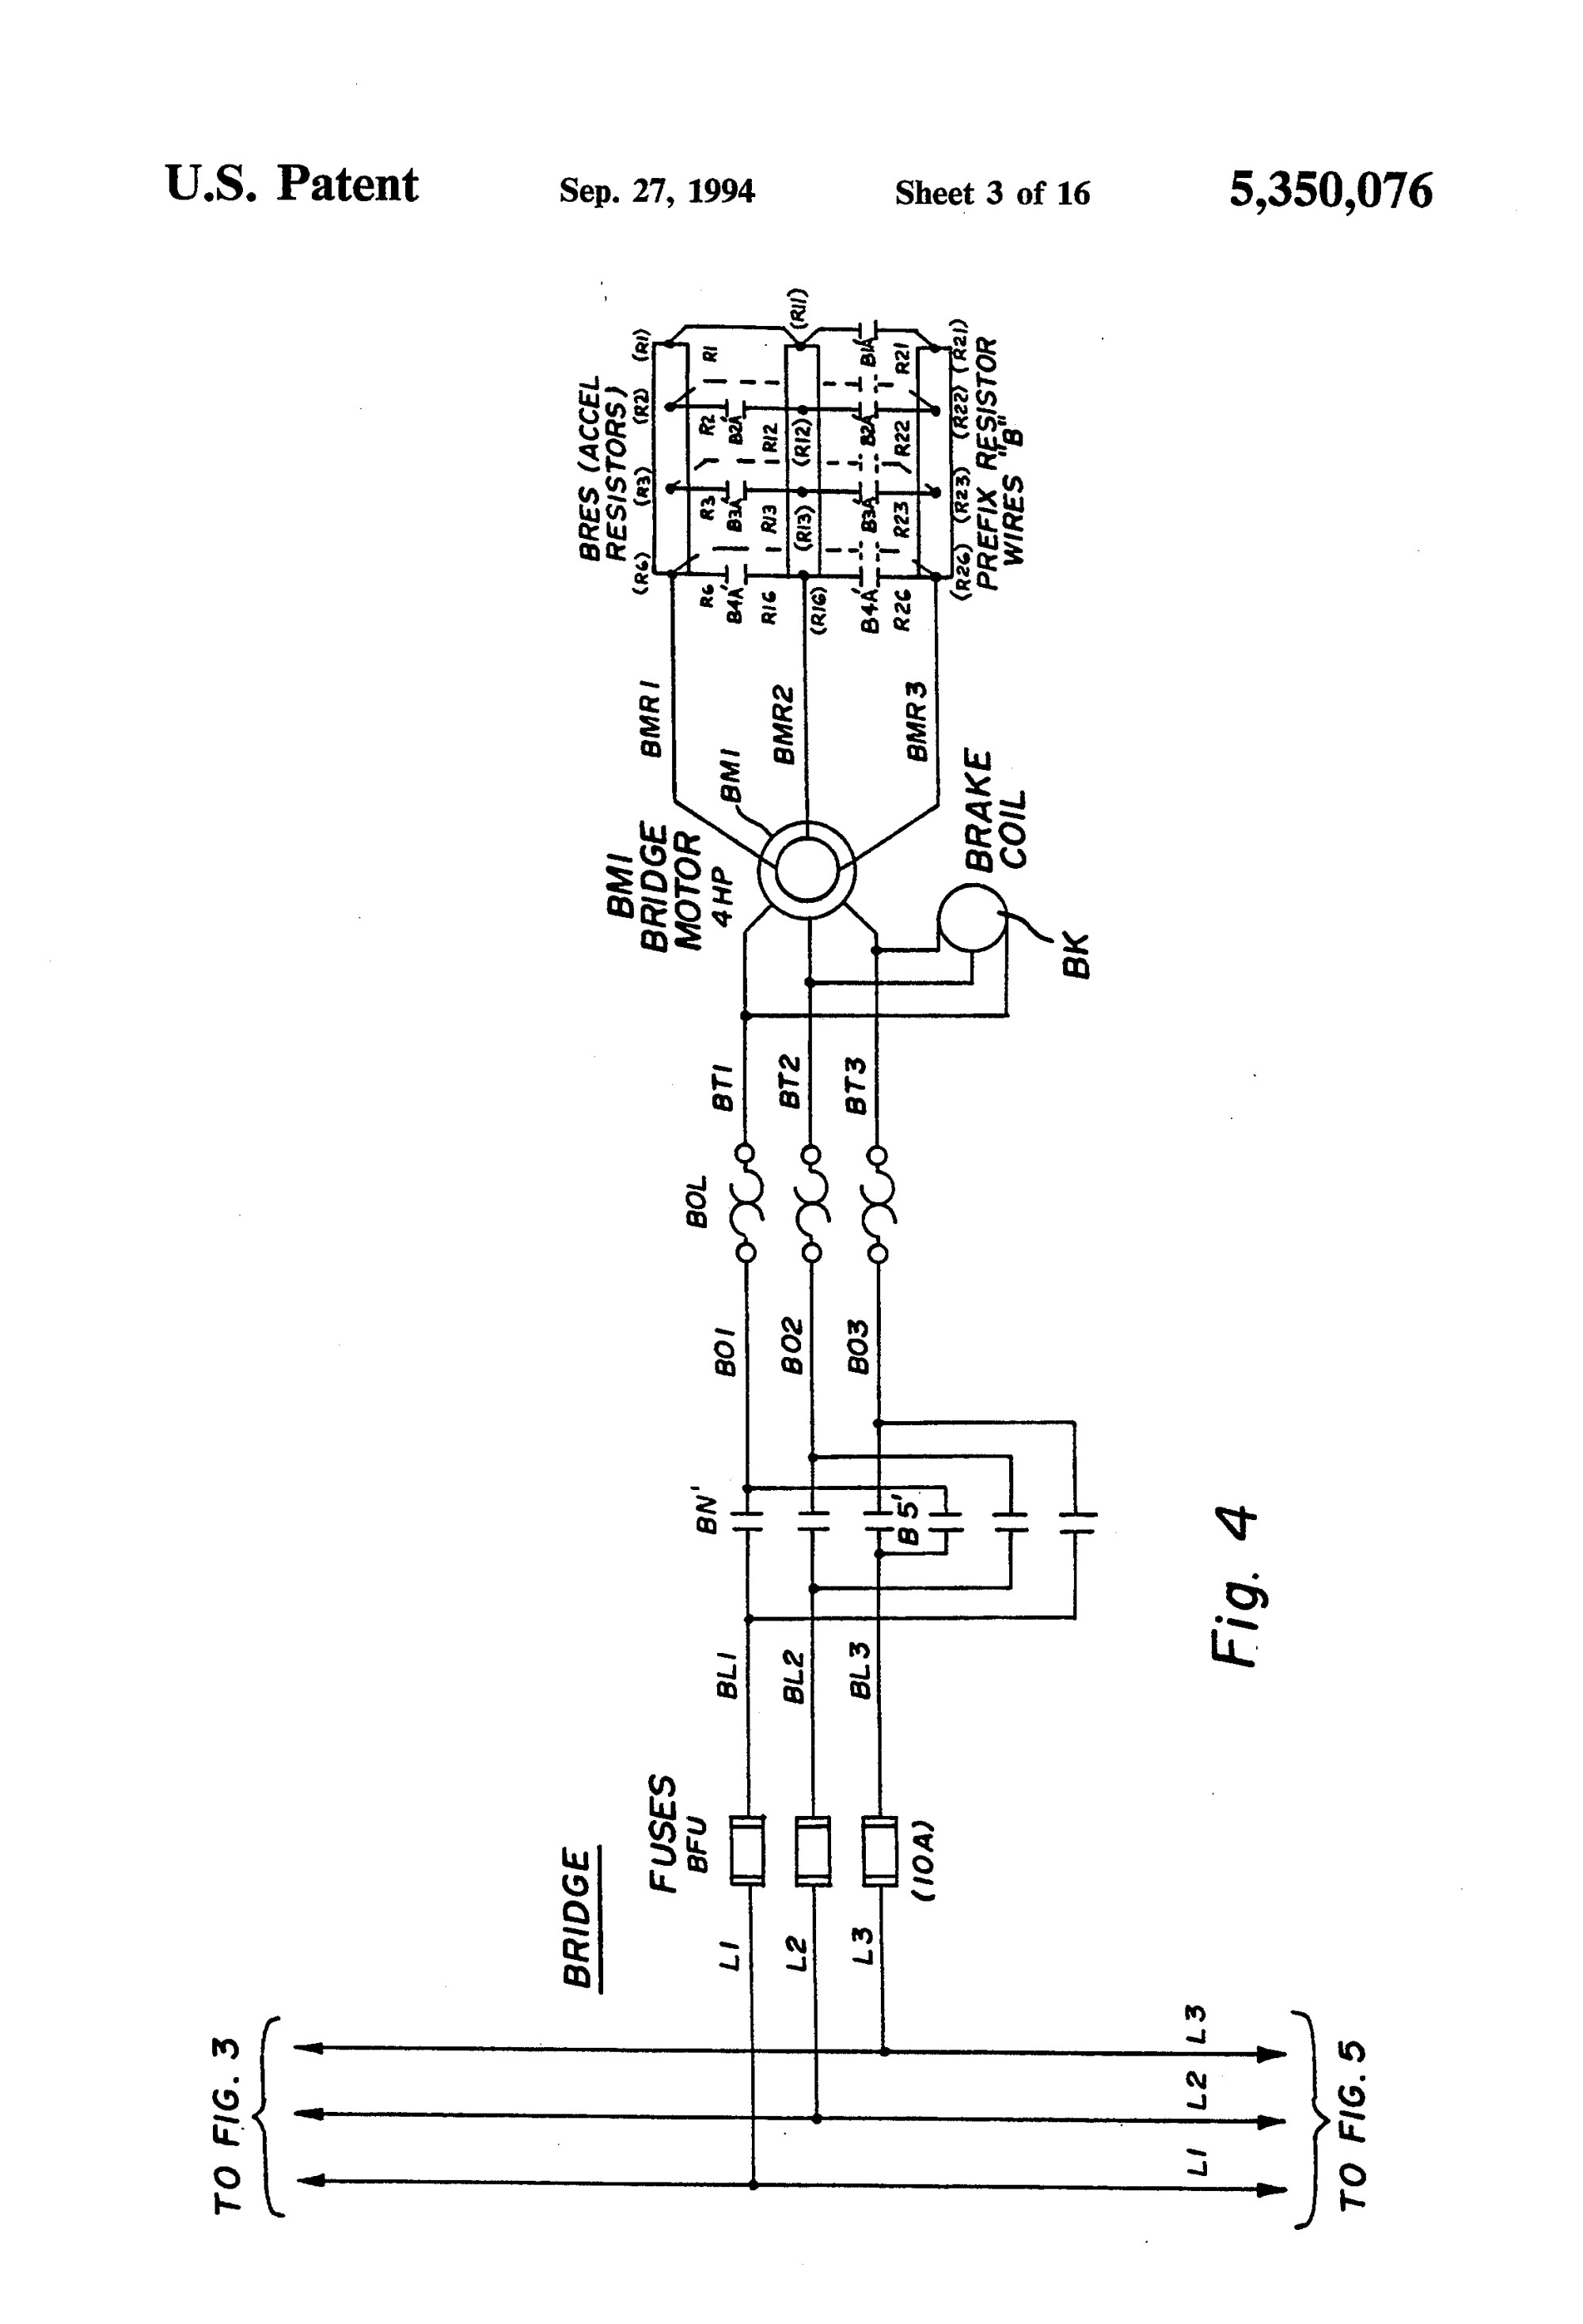 hight resolution of kone hoist wiring diagram electrical engineering wiring diagramkone hoist wiring diagram little wiring diagramskone crane wiring